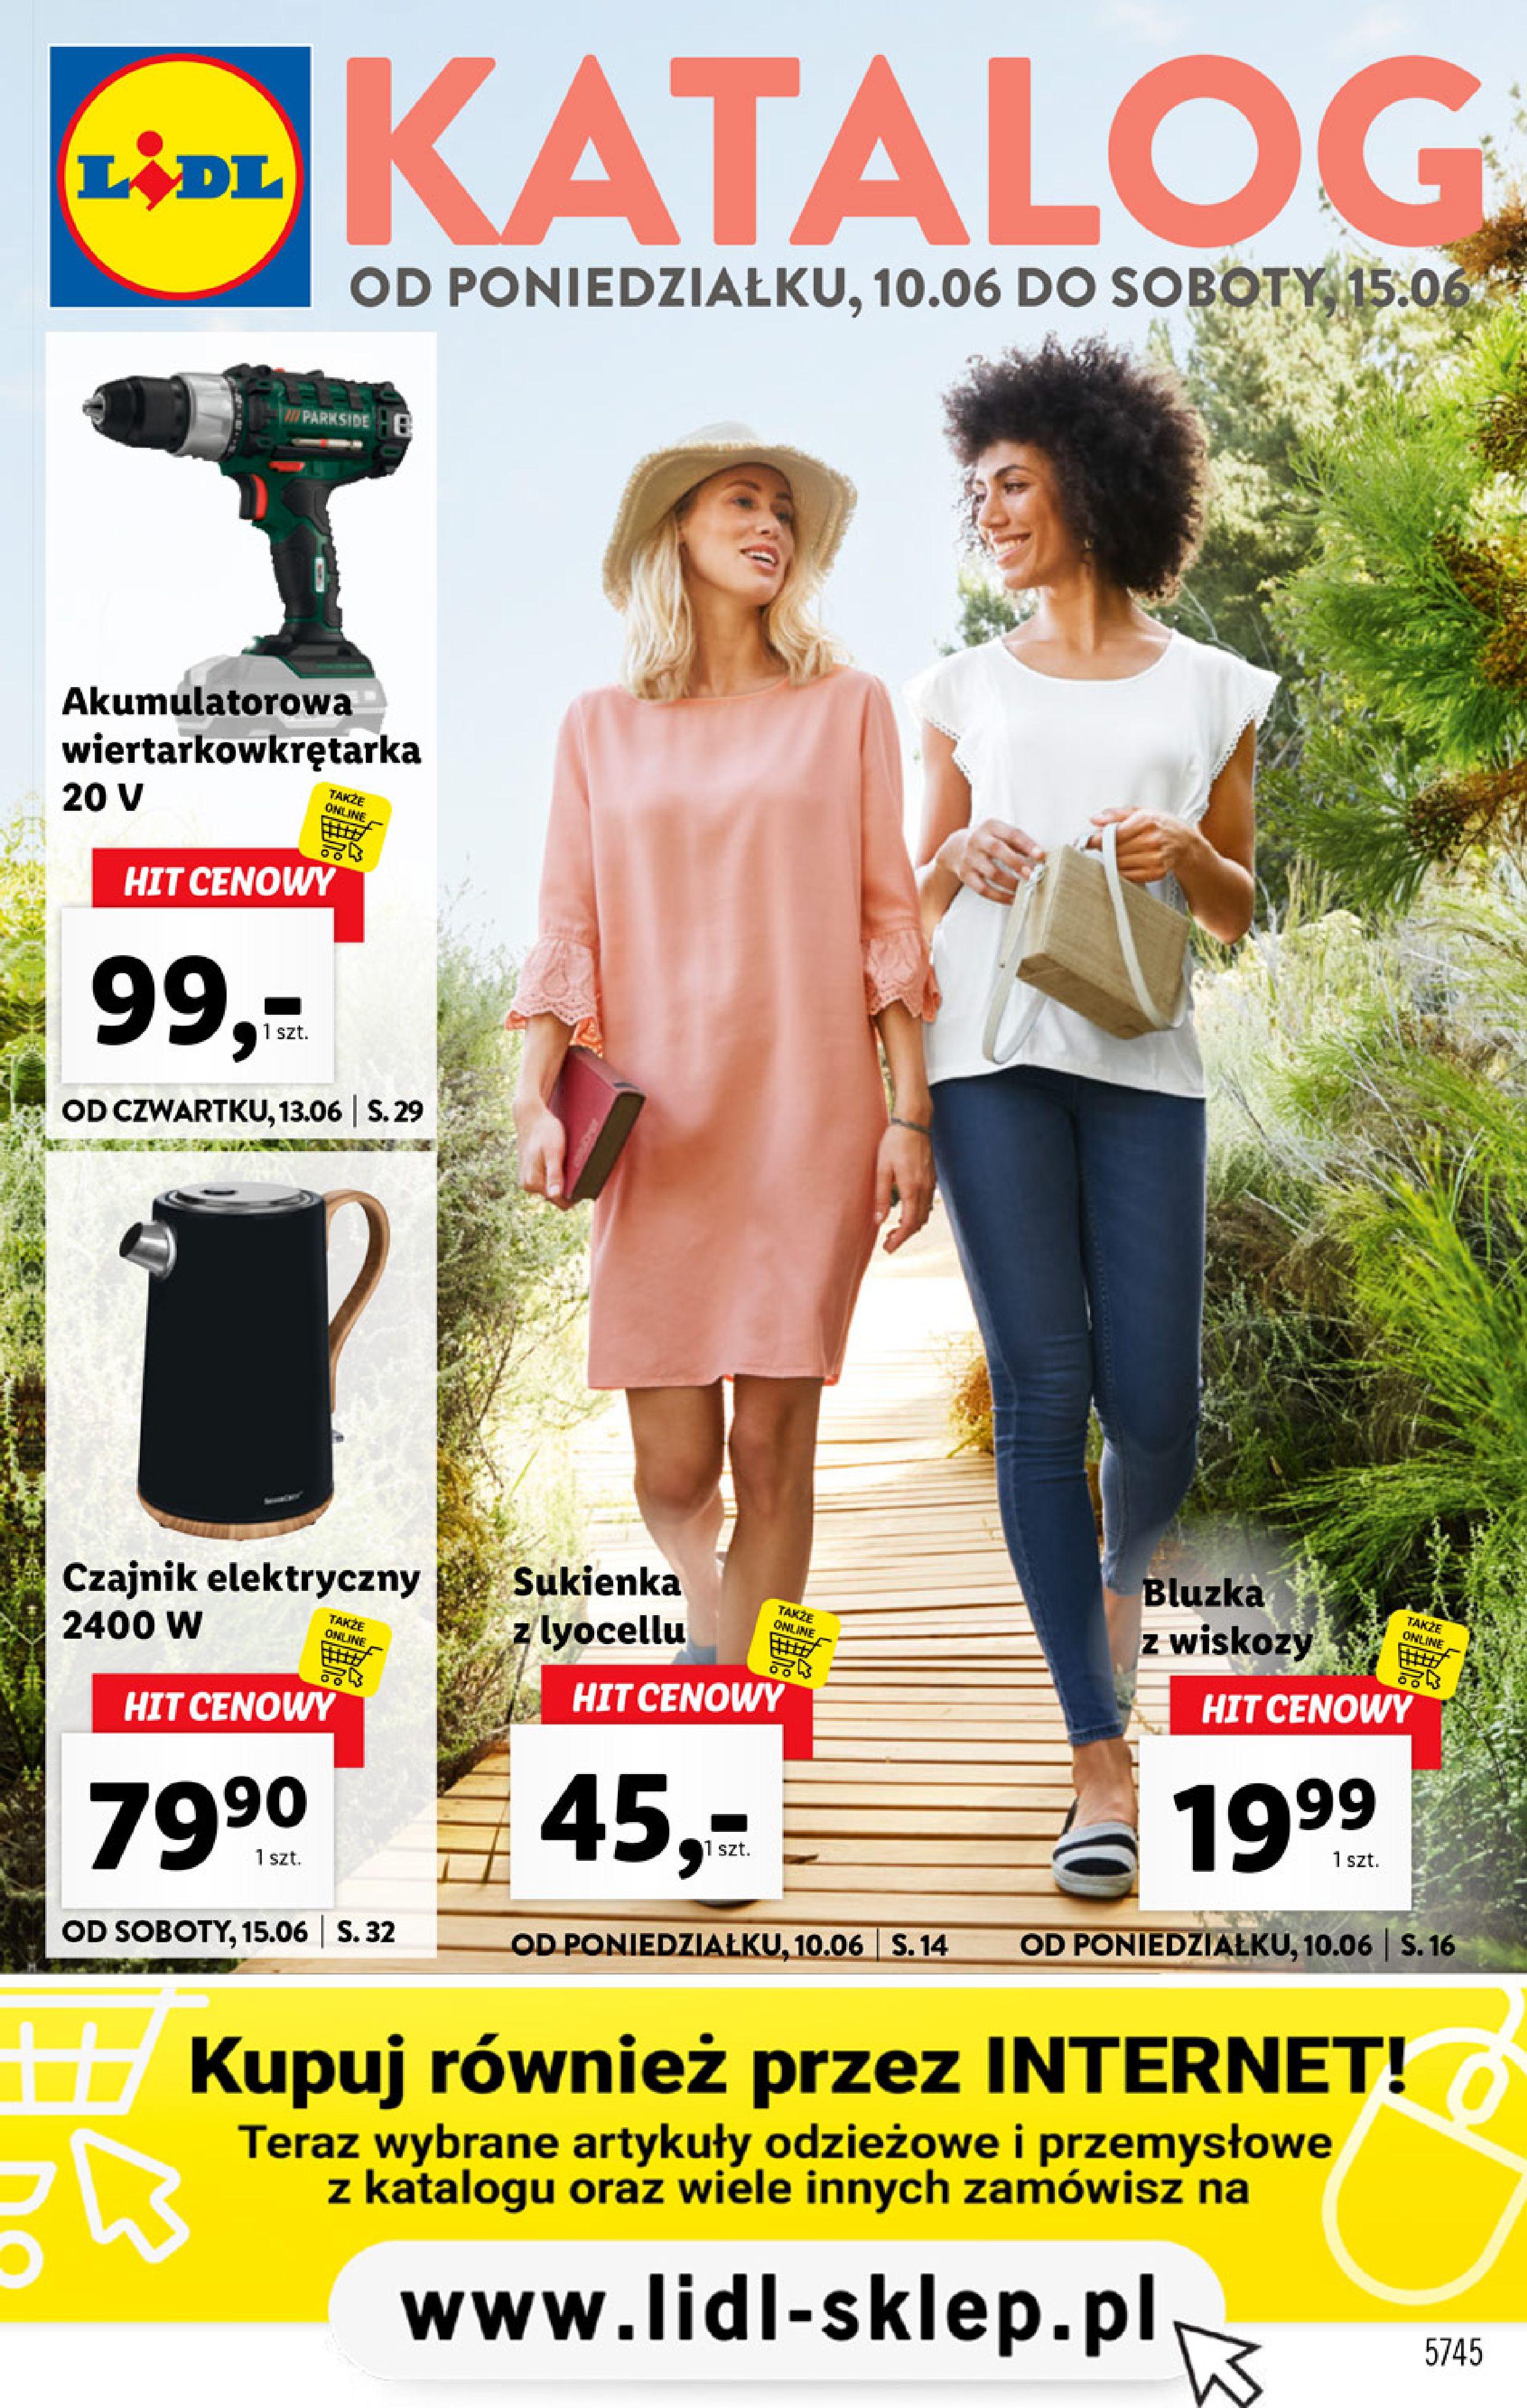 Gazetka Lidl - Katalog-09.06.2019-15.06.2019-page-